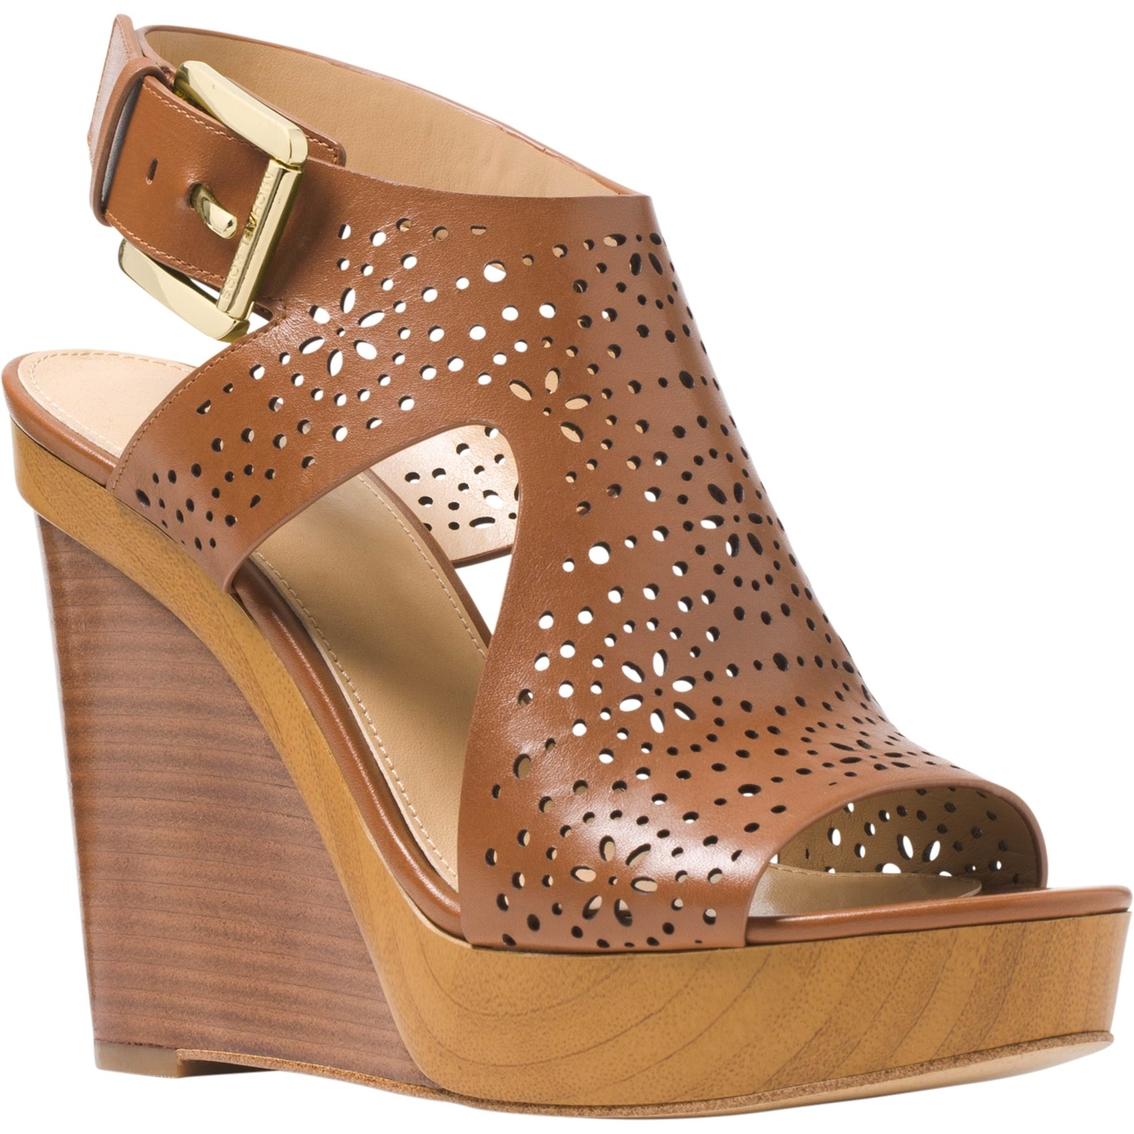 1e1ca8f54104 Michael Kors Josephine Wedge Sandals